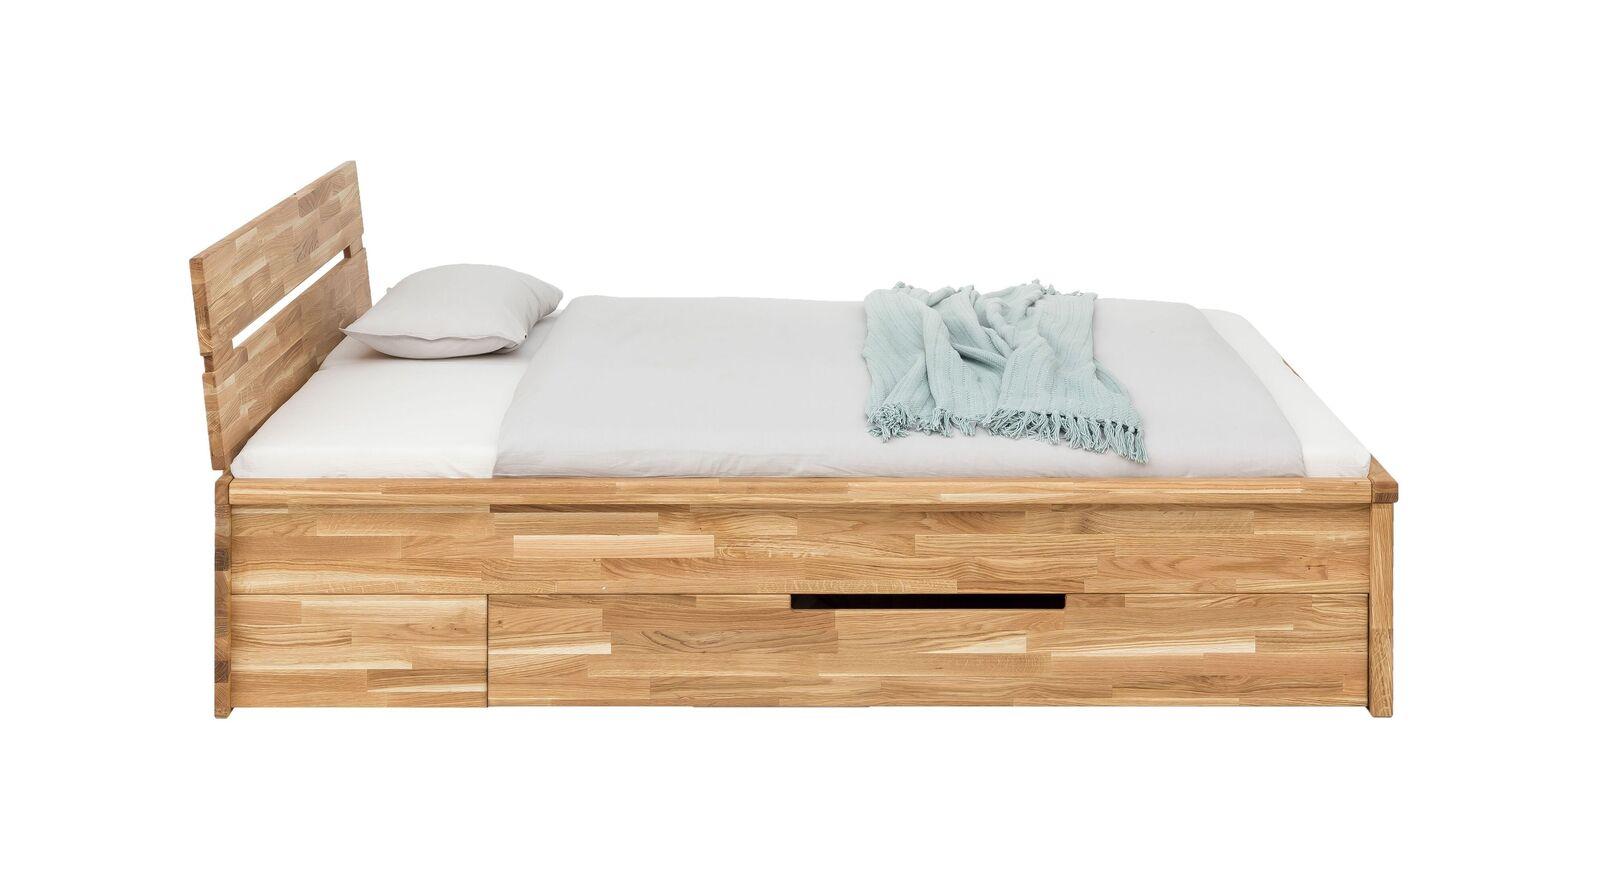 Stilvolles Schubkasten-Bett Sumaß mit Blende